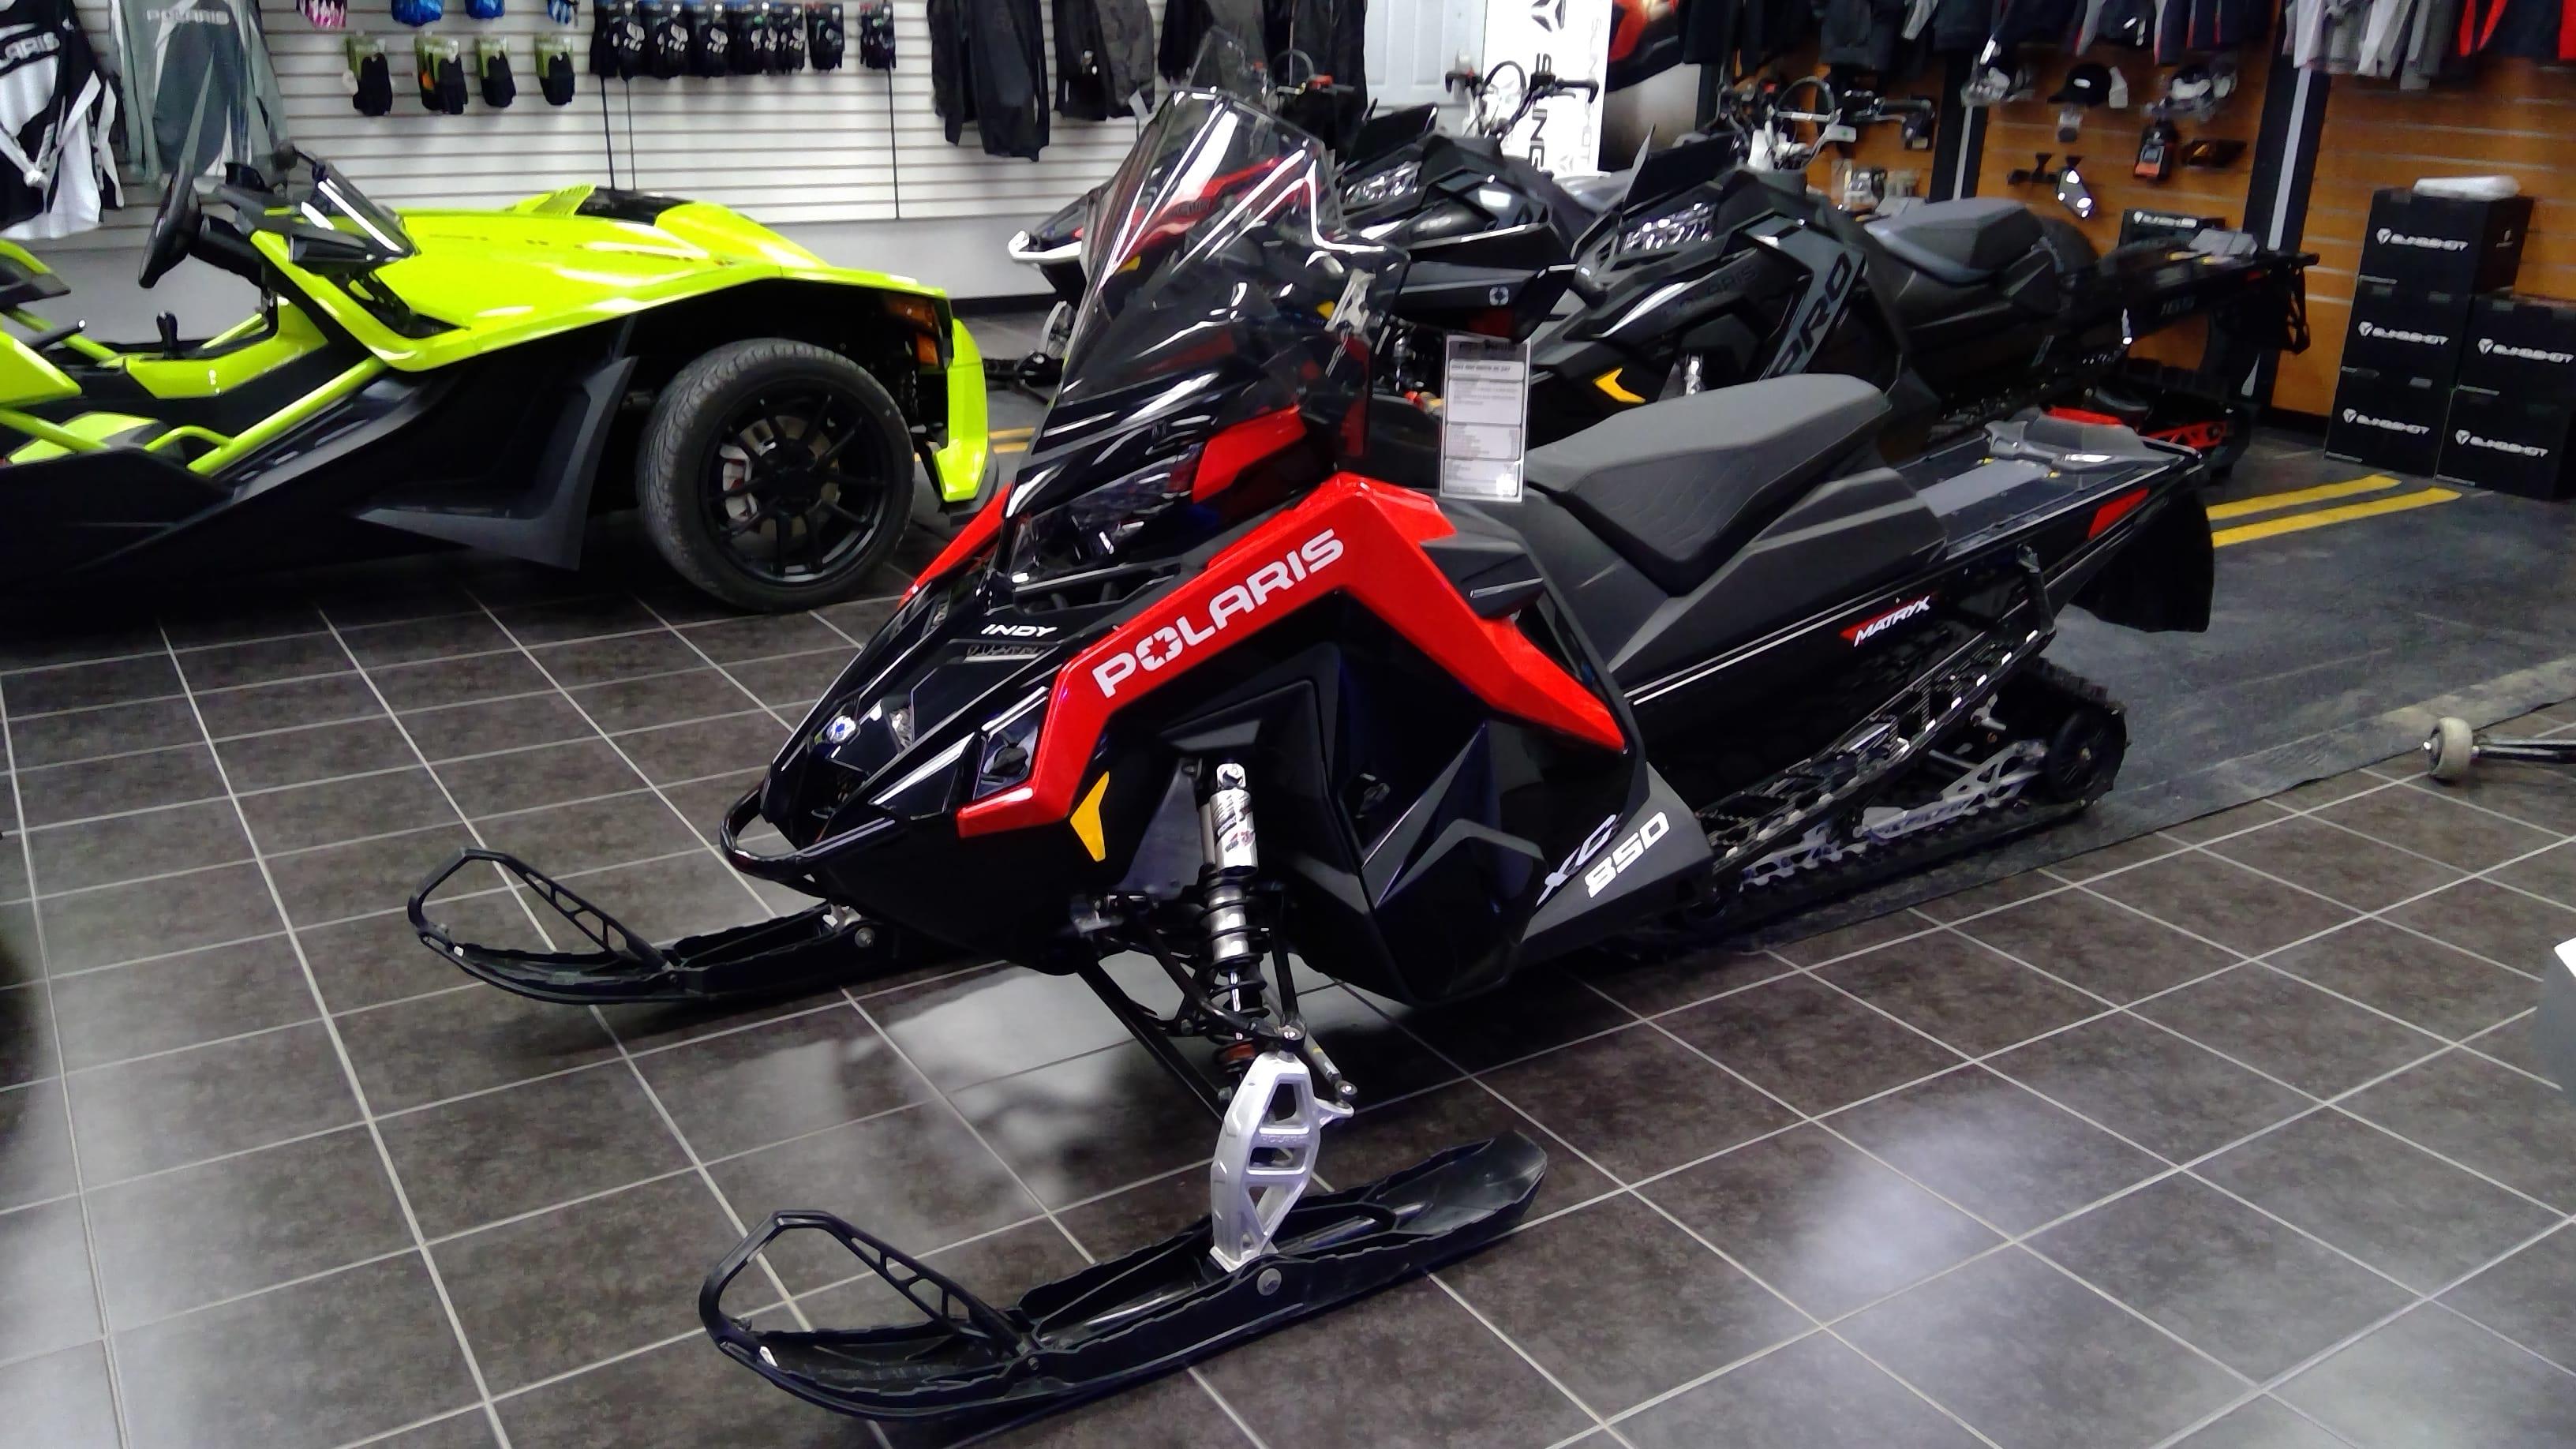 Boutique de la moto a Matane